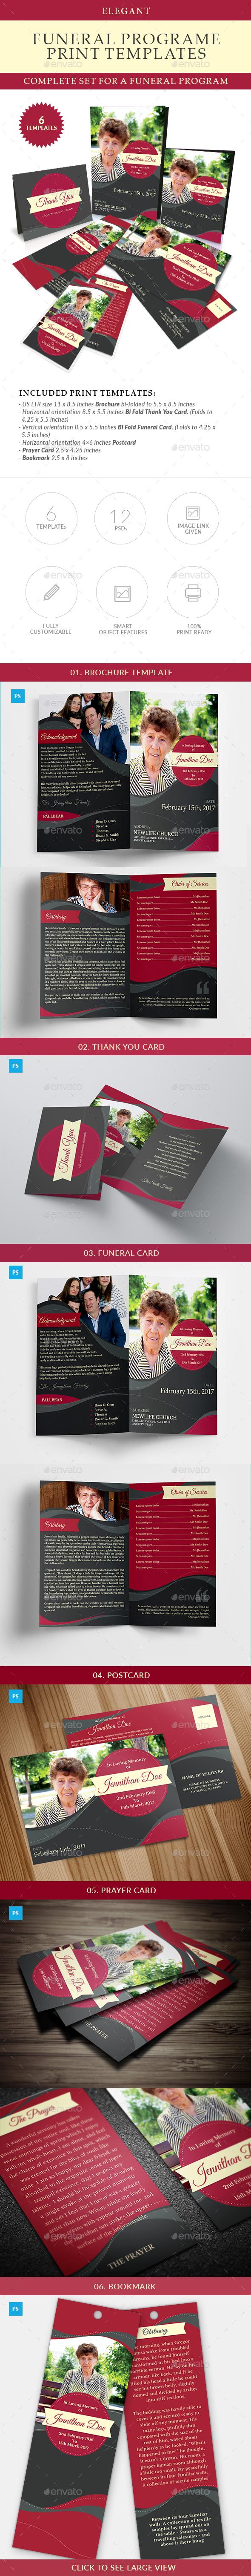 Elegant Funeral Program Templates Combo Set - Miscellaneous Print Templates